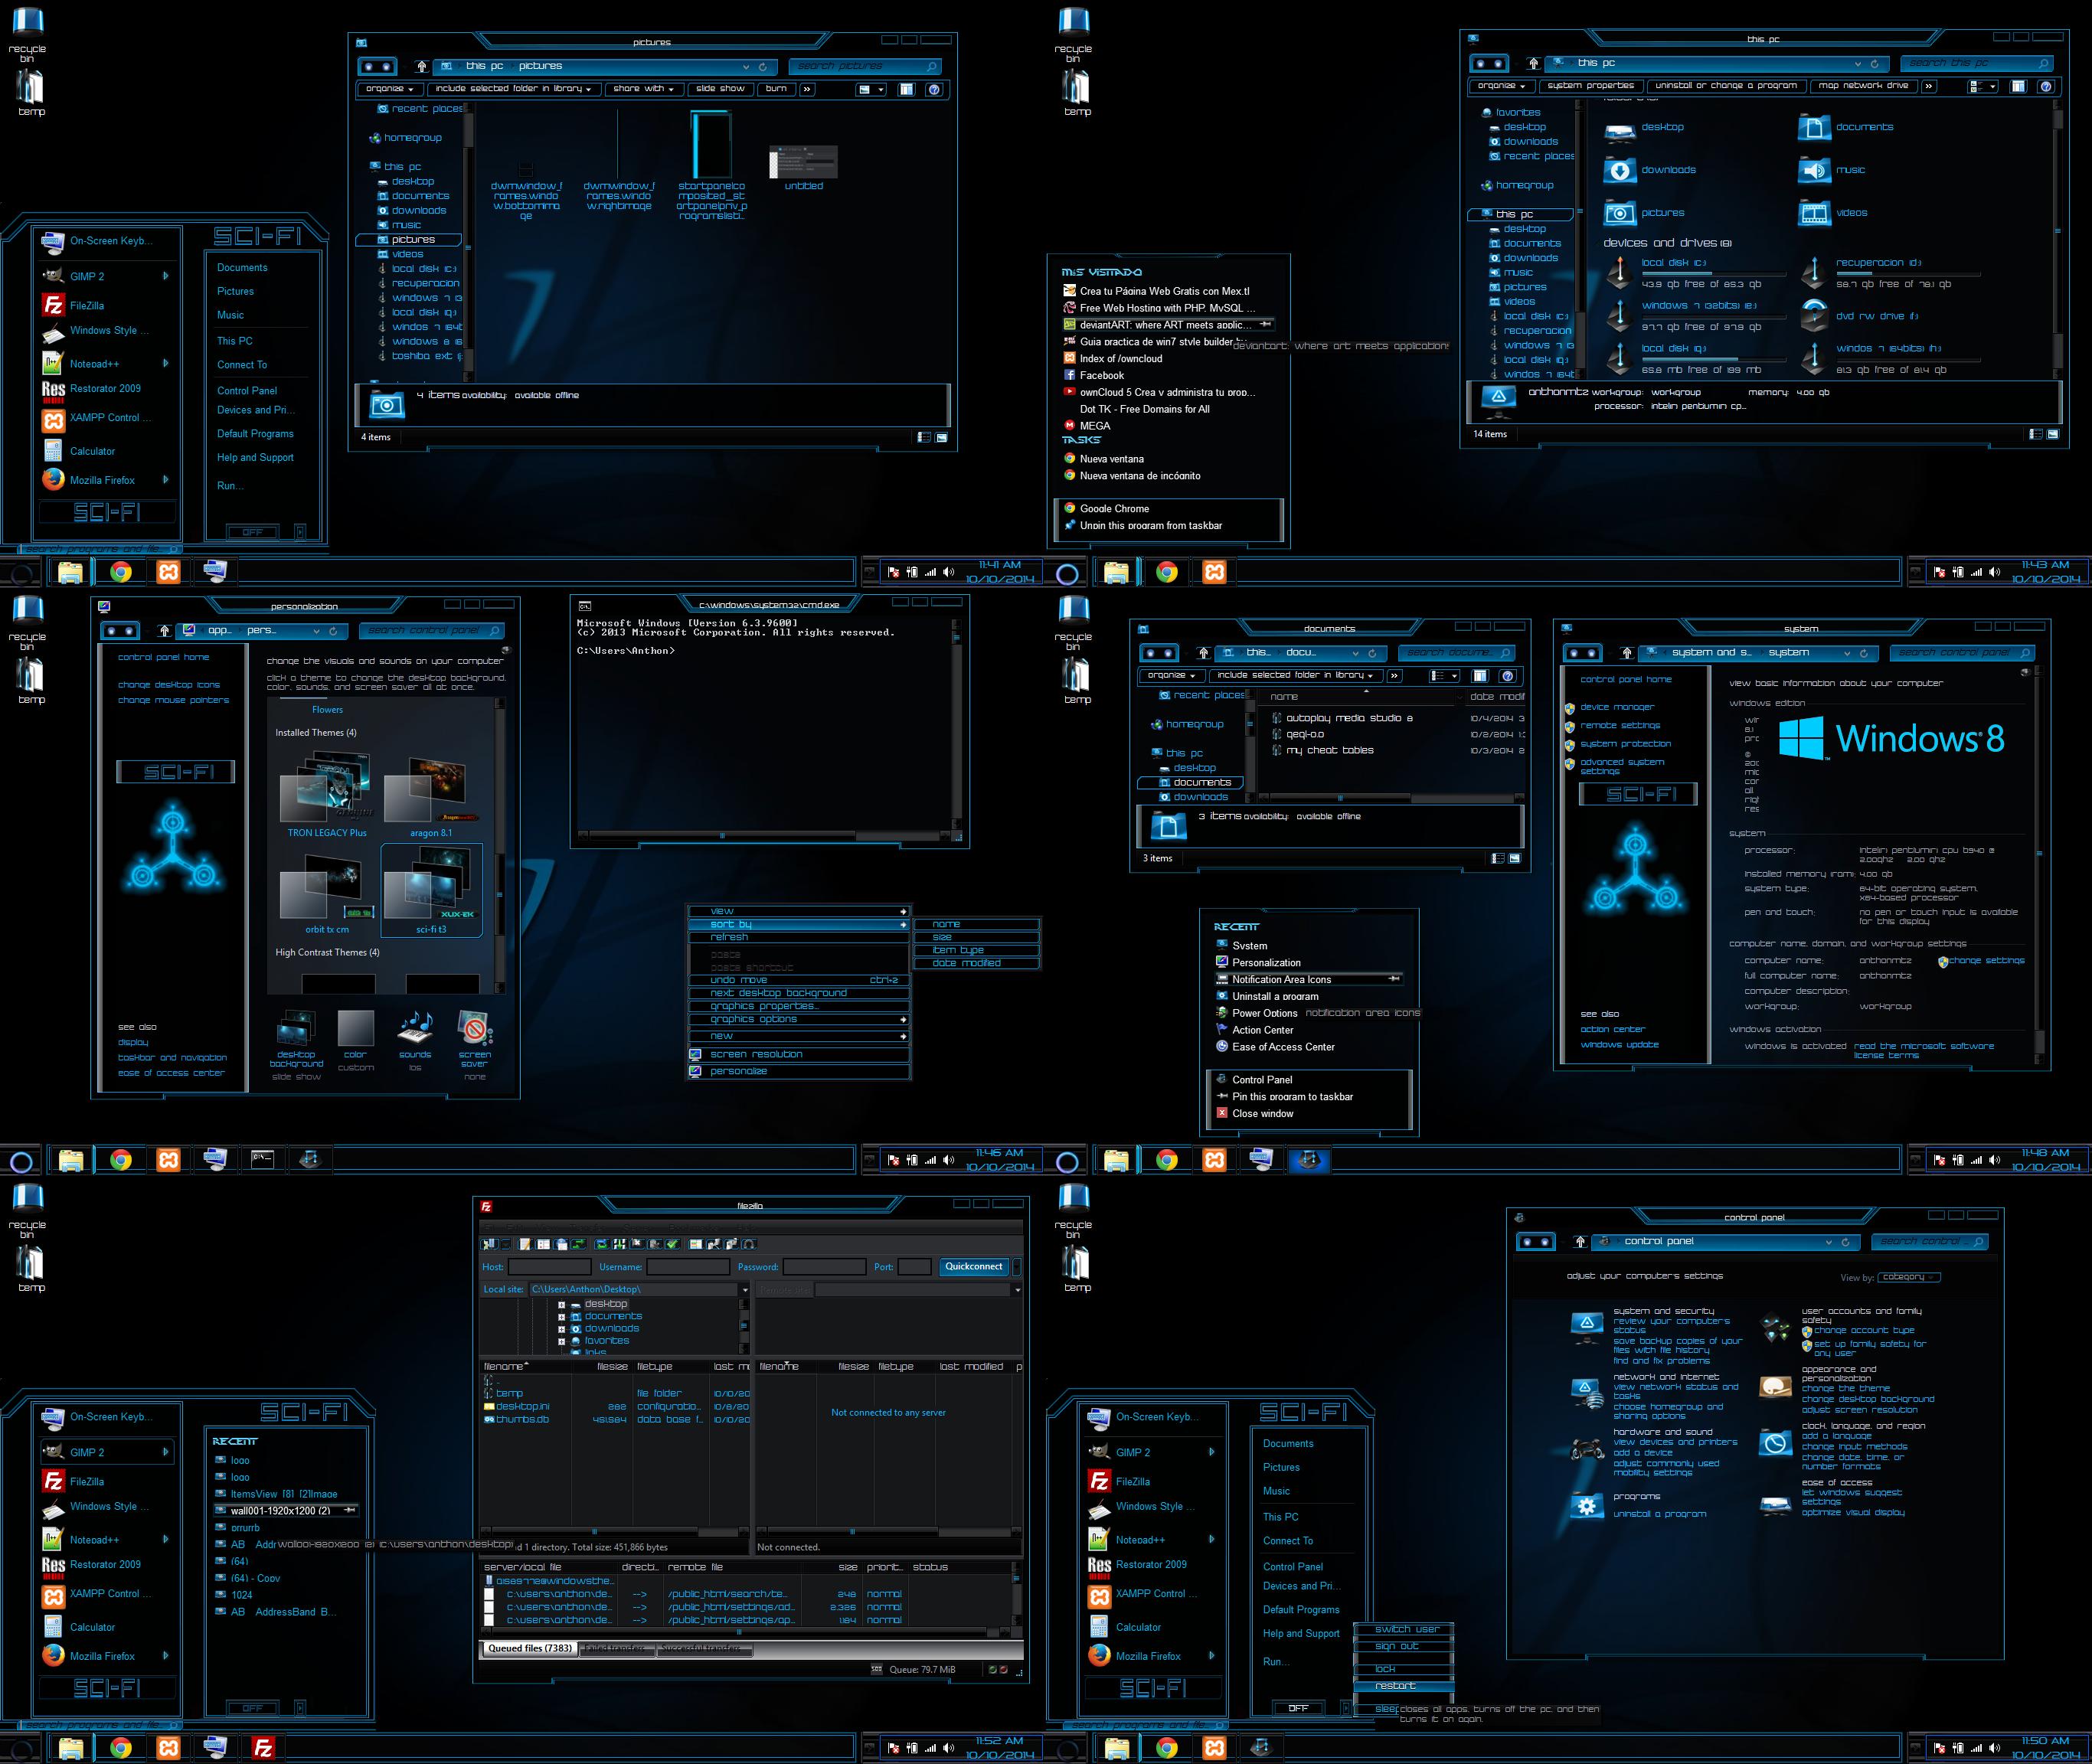 Google themes windows 8 -  Windows 8 Theme Sci Fi By Tono3022